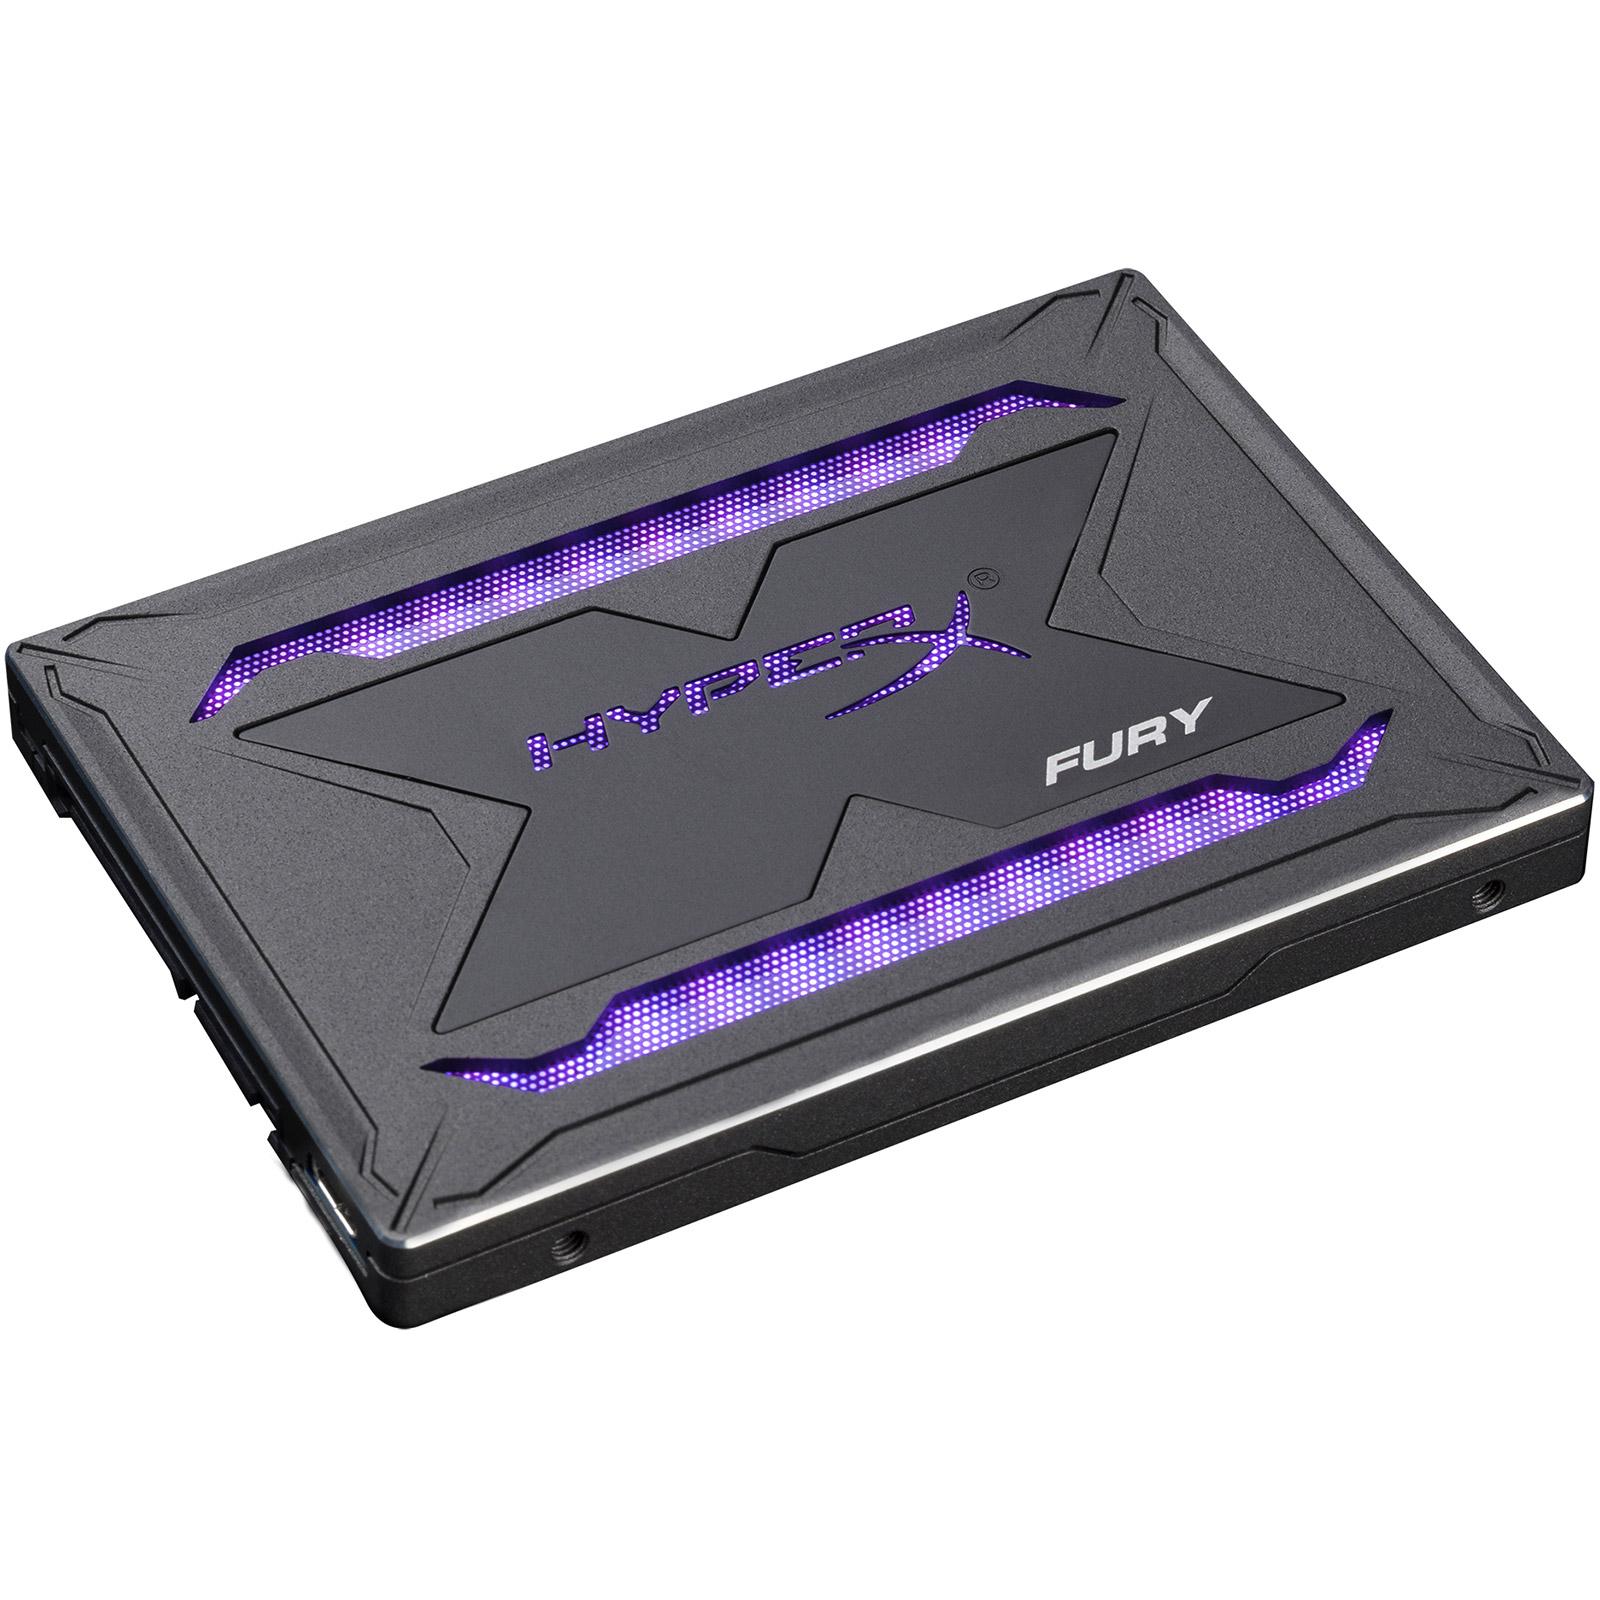 "Disque SSD HyperX Fury RGB SSD 480 Go SSD 480 Go 9.5 mm 2.5"" Serial ATA 6Gbit/s avec rétroéclairage RGB"